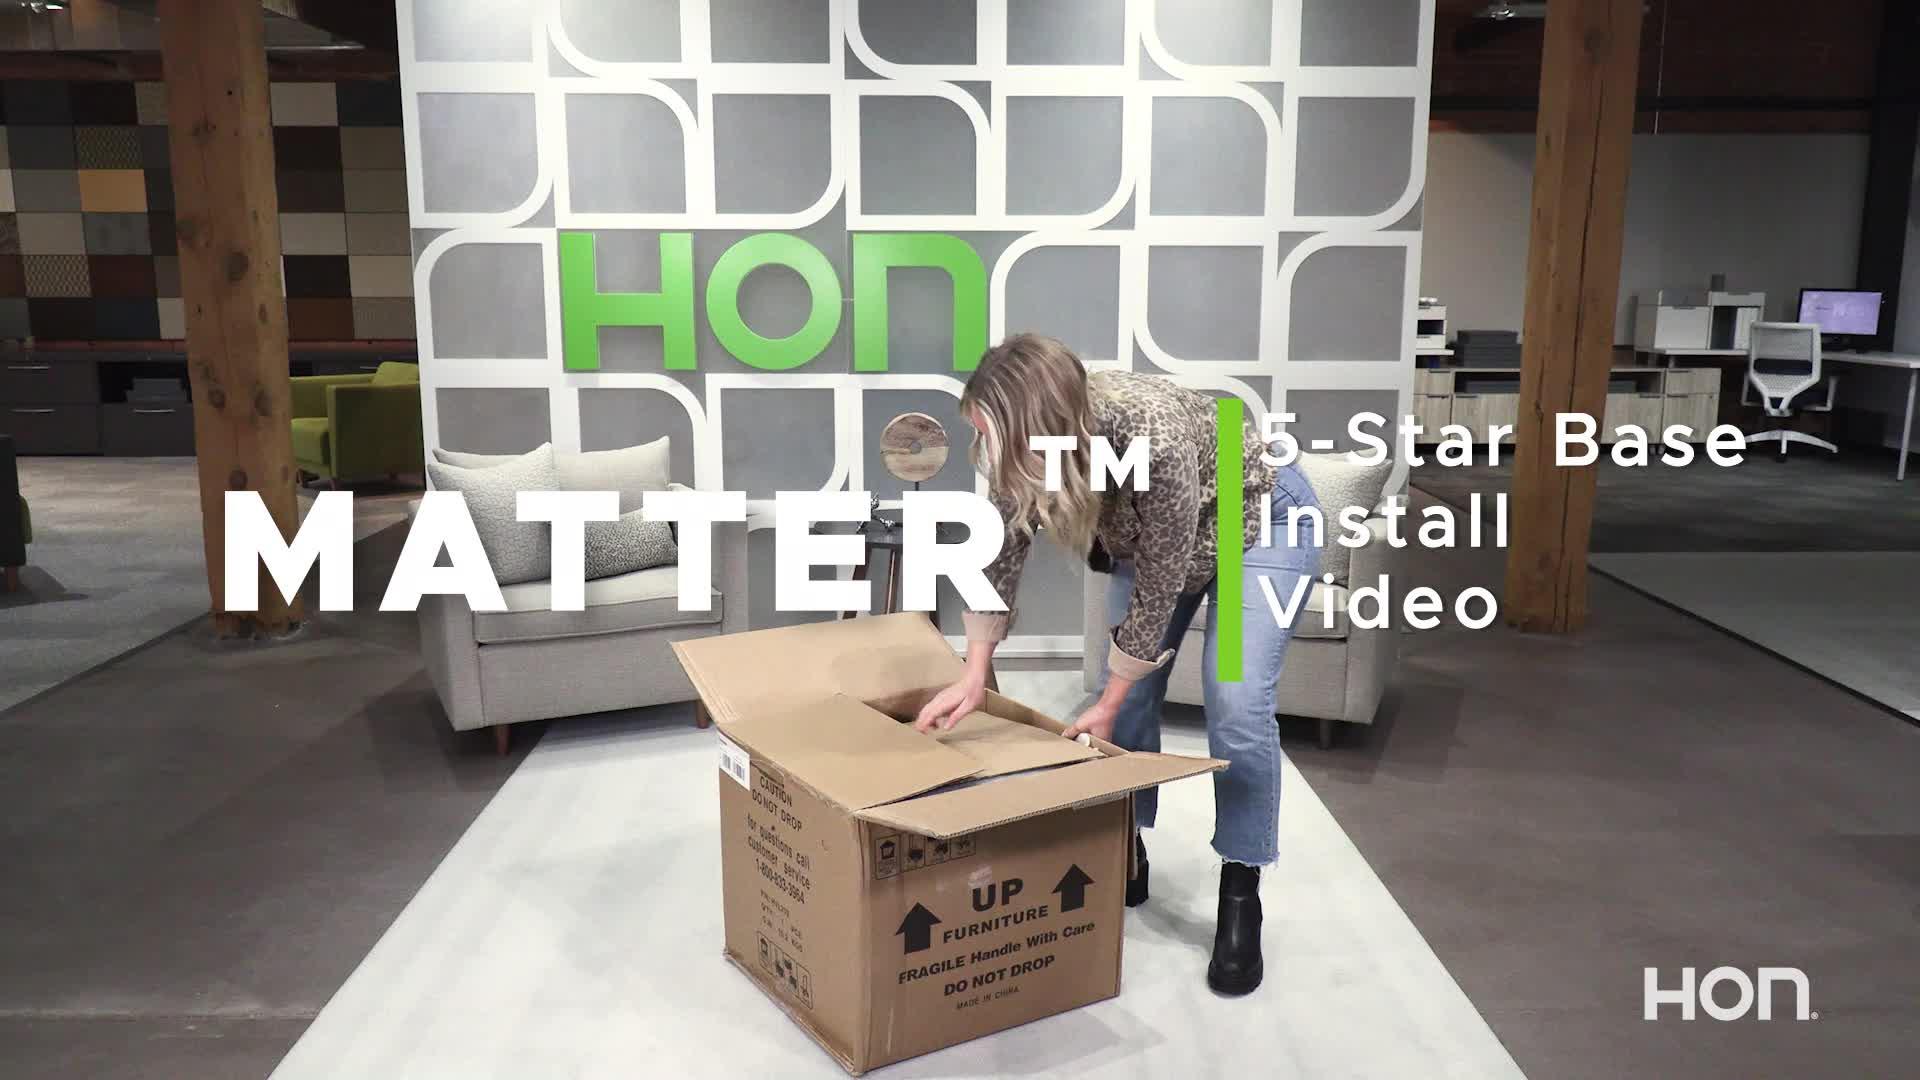 Matter 5 Star Base Installation video link